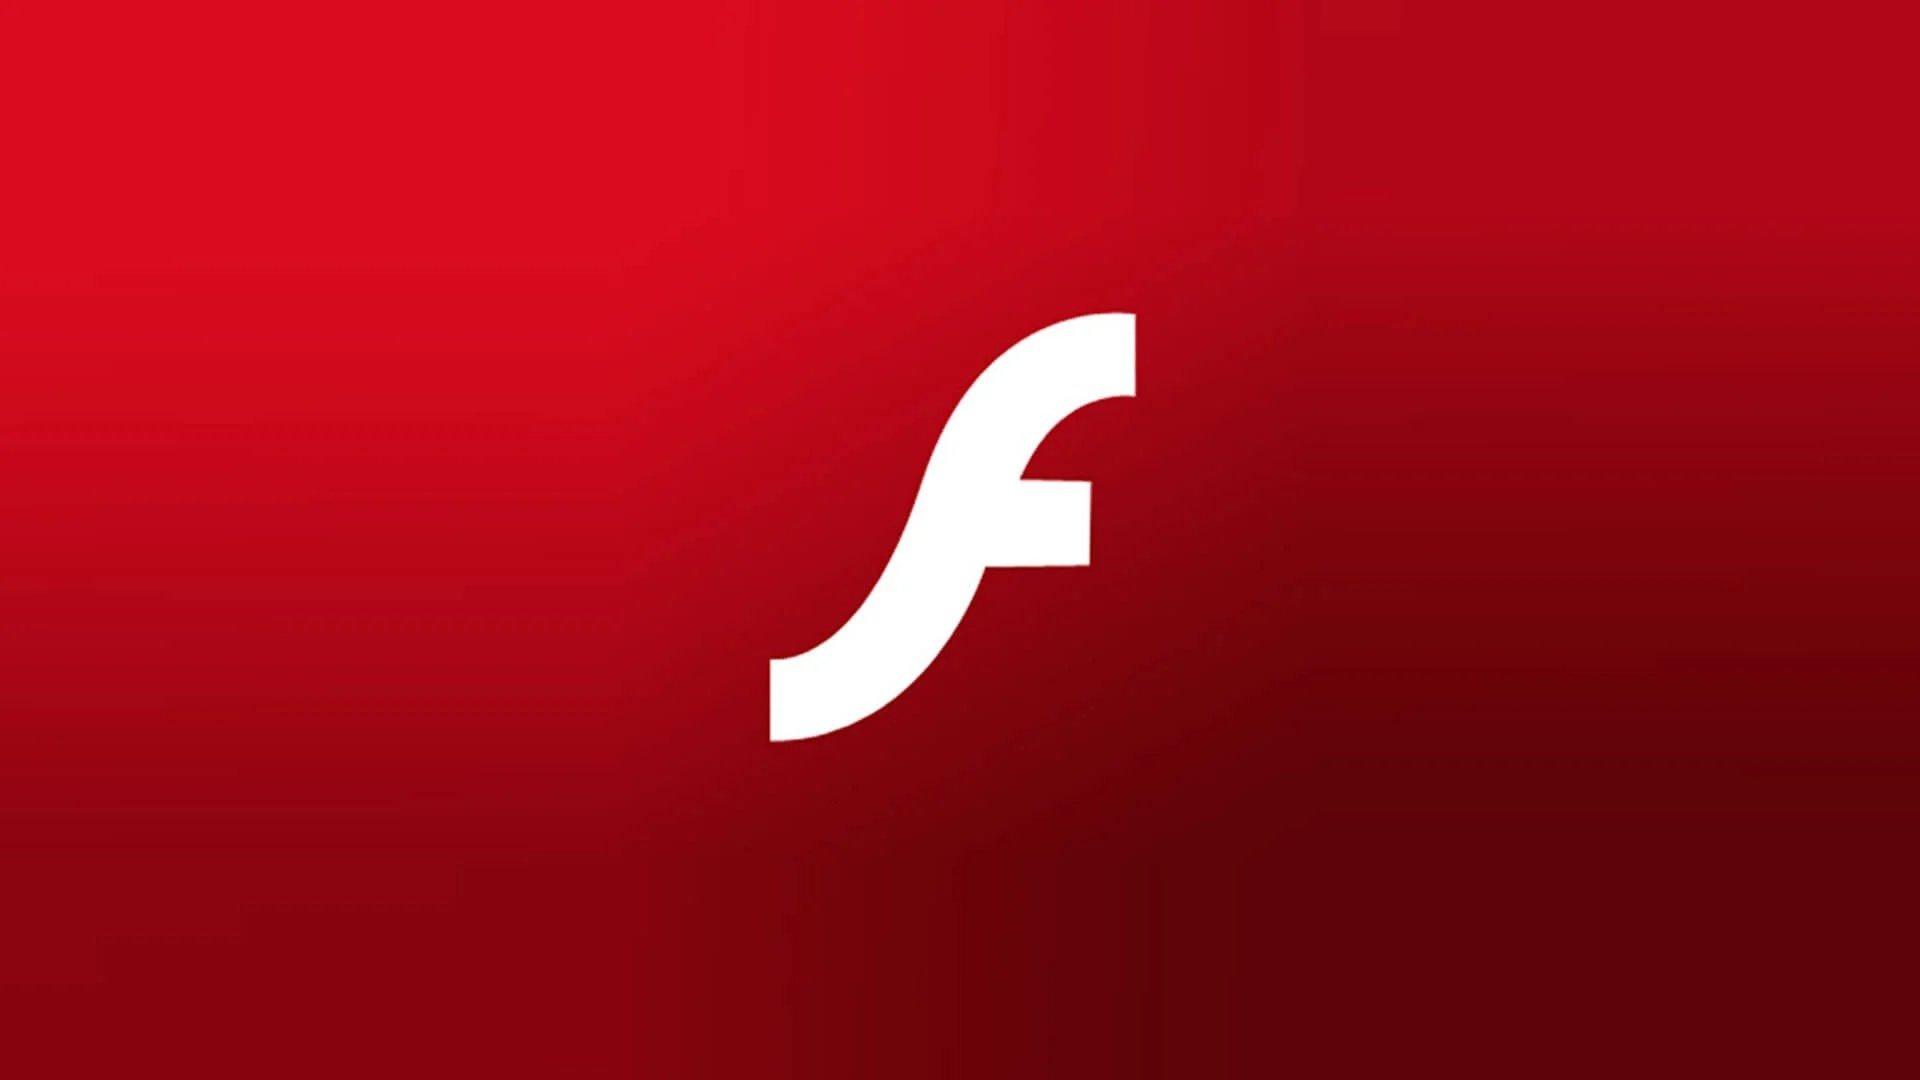 Adobe Flash logo